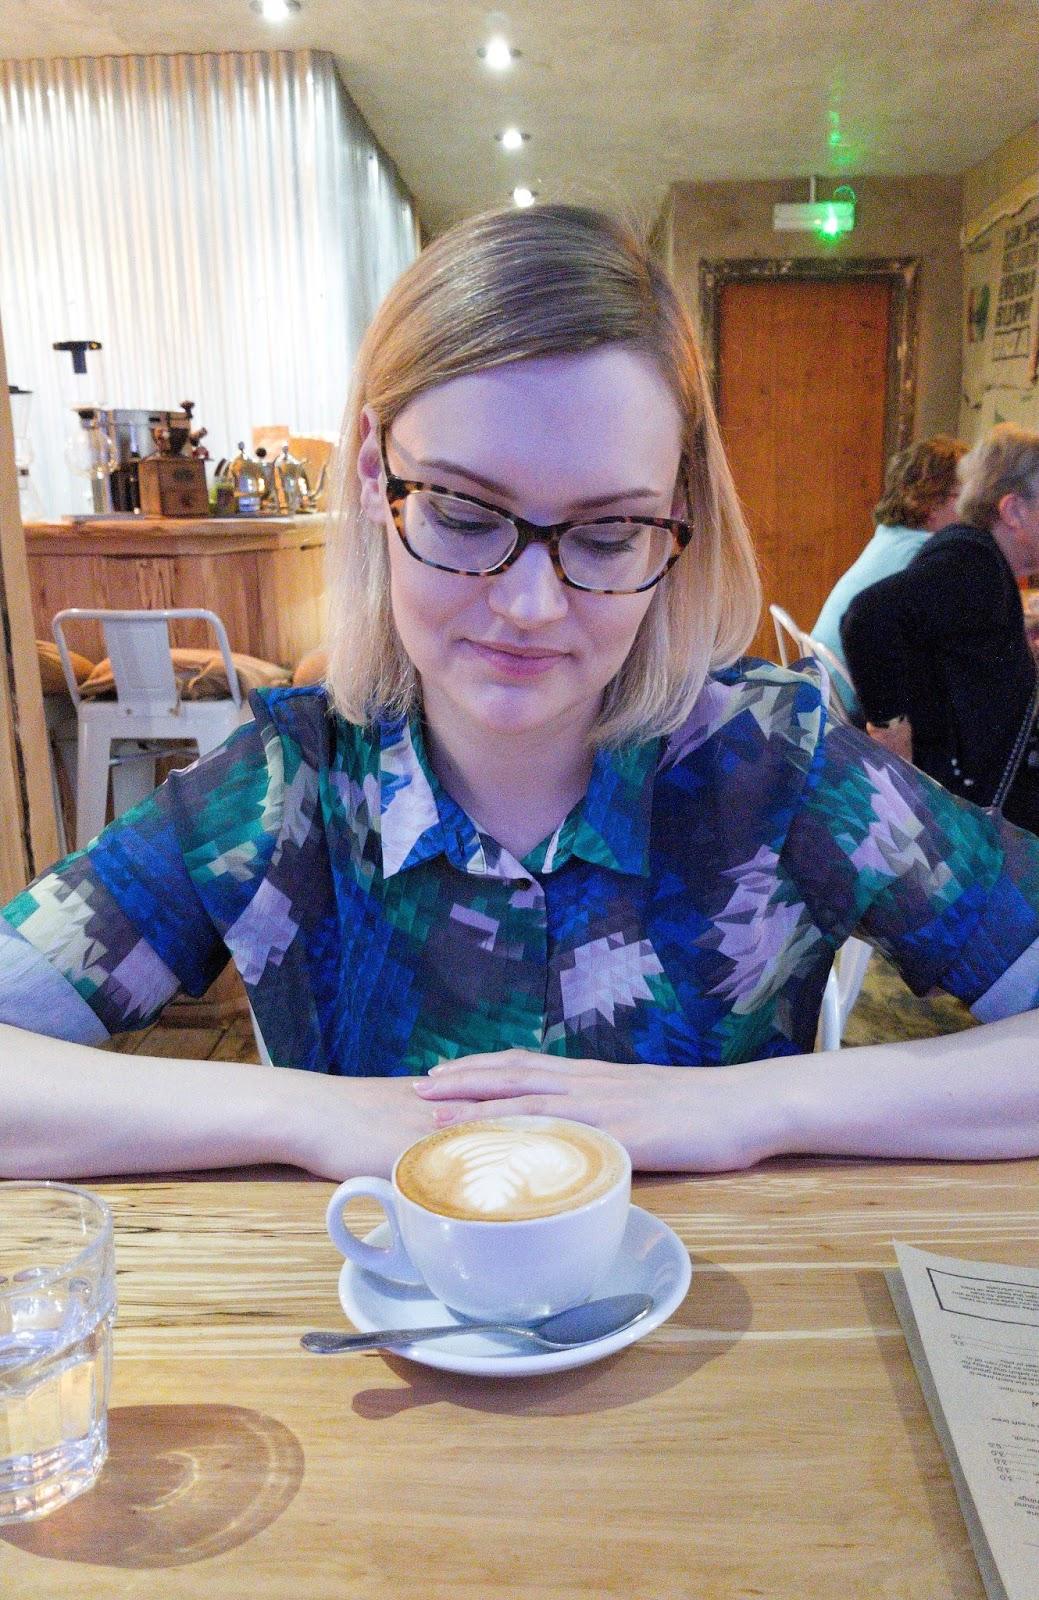 Top 5 coffee shops in Edinburgh Cairngorm, Castello, Brew Lab, Low Down,